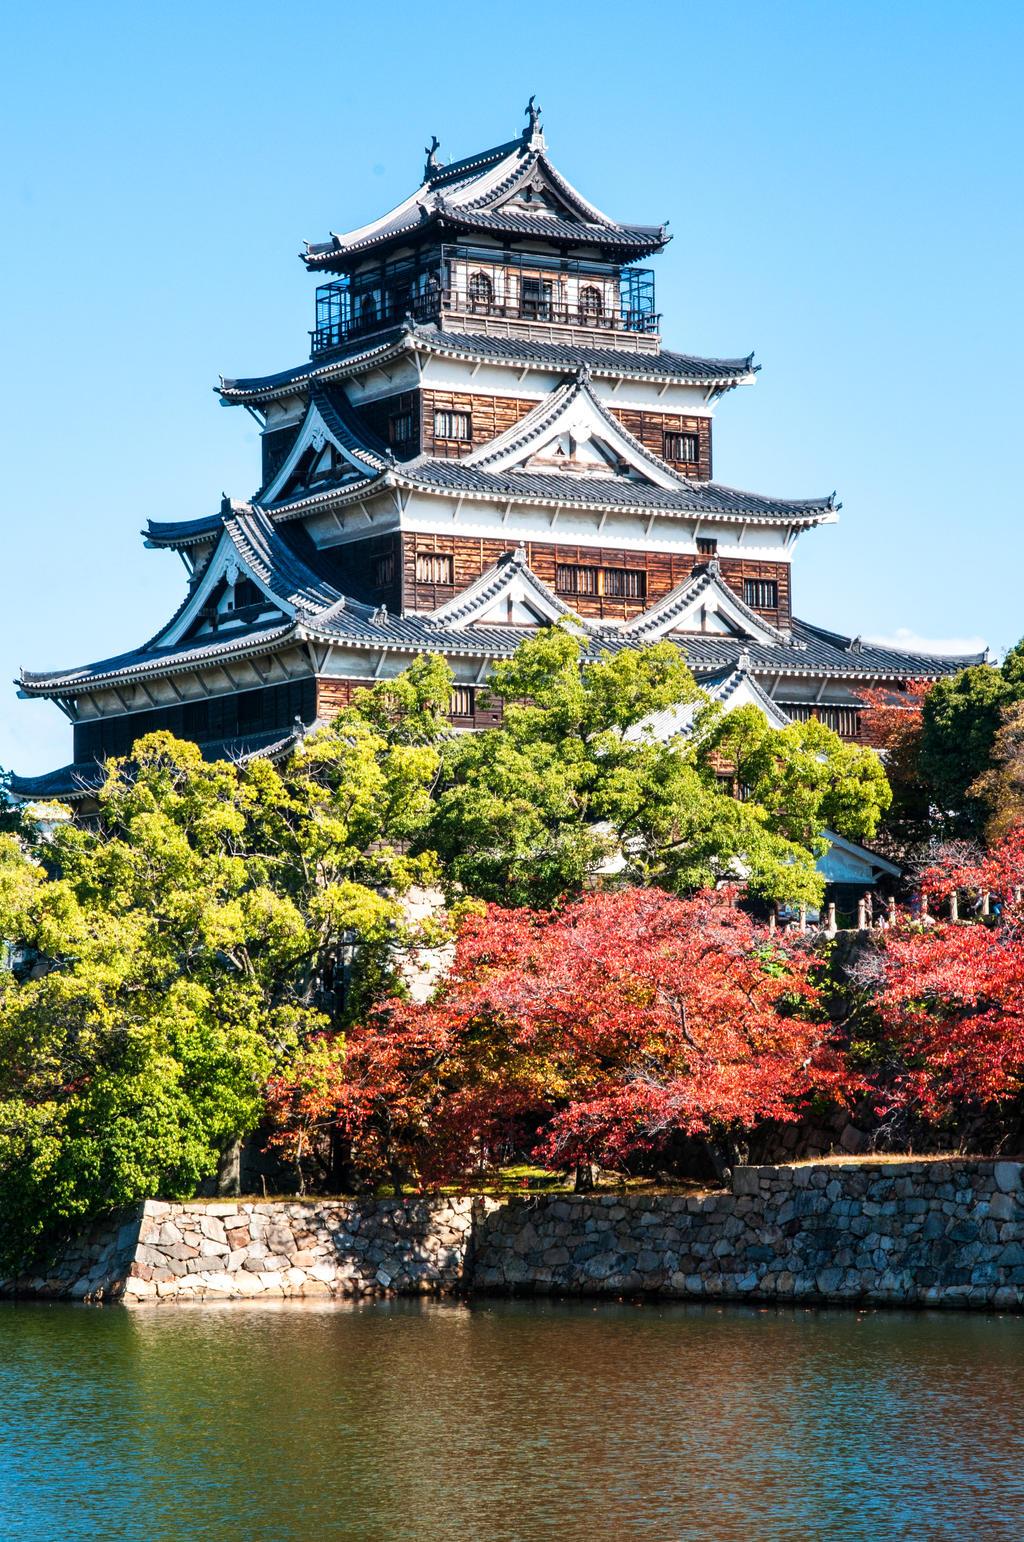 Hiroshima Castle, Hiroshima, Japan by andrusm on DeviantArt